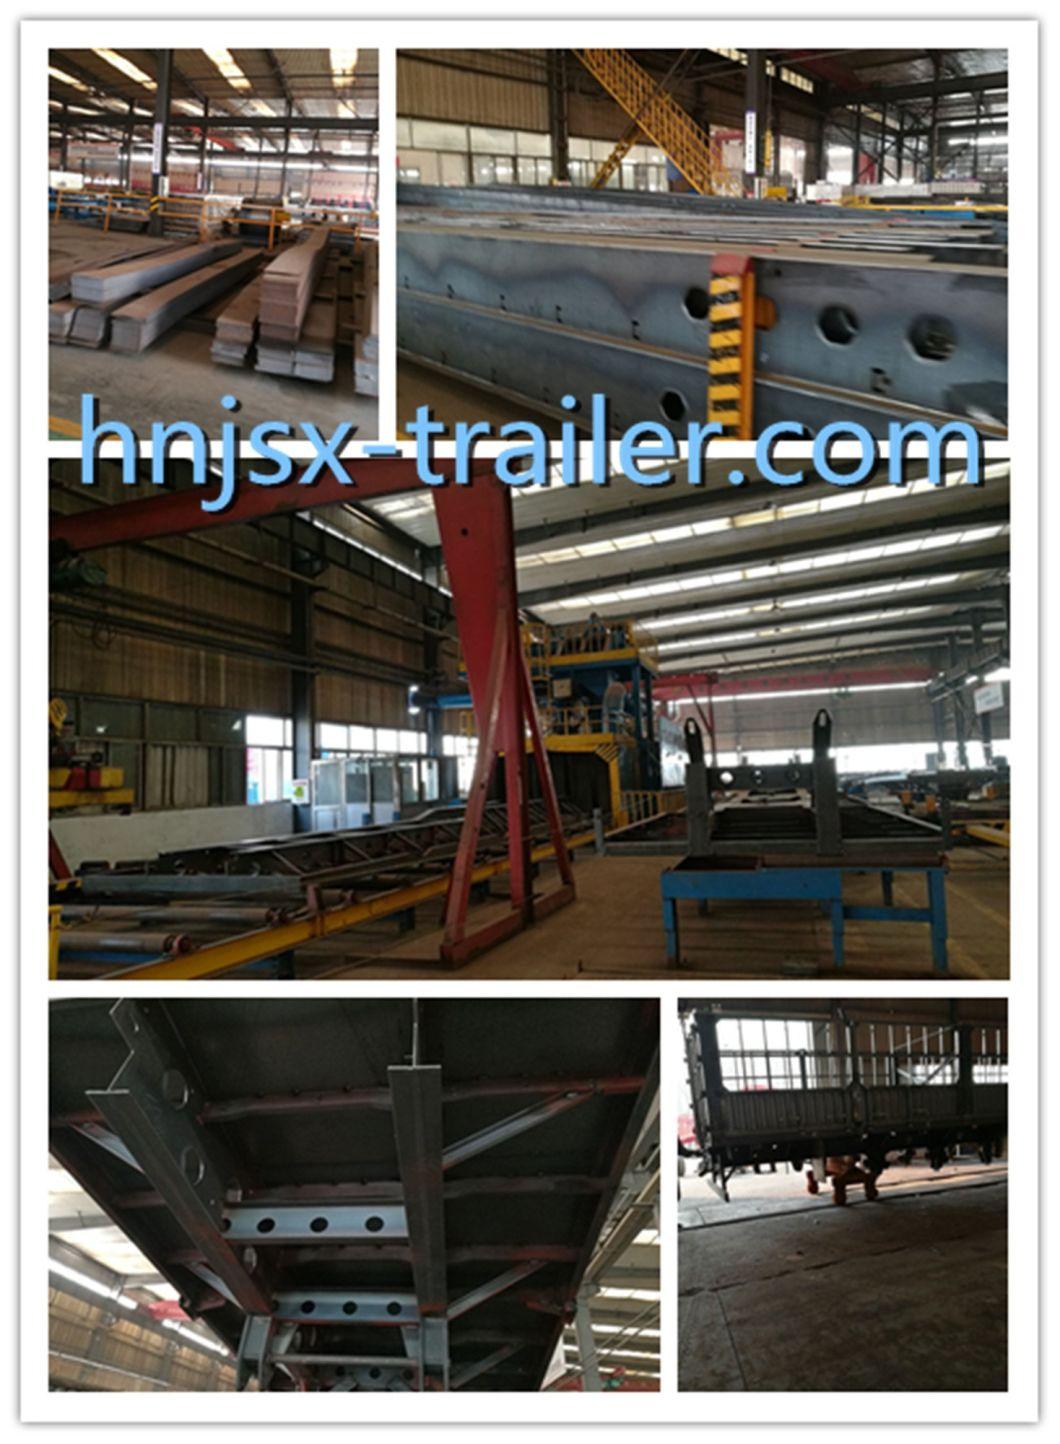 3 Axle Flatbed Transport Co<em></em>ntainer Semi Trailer for Sale